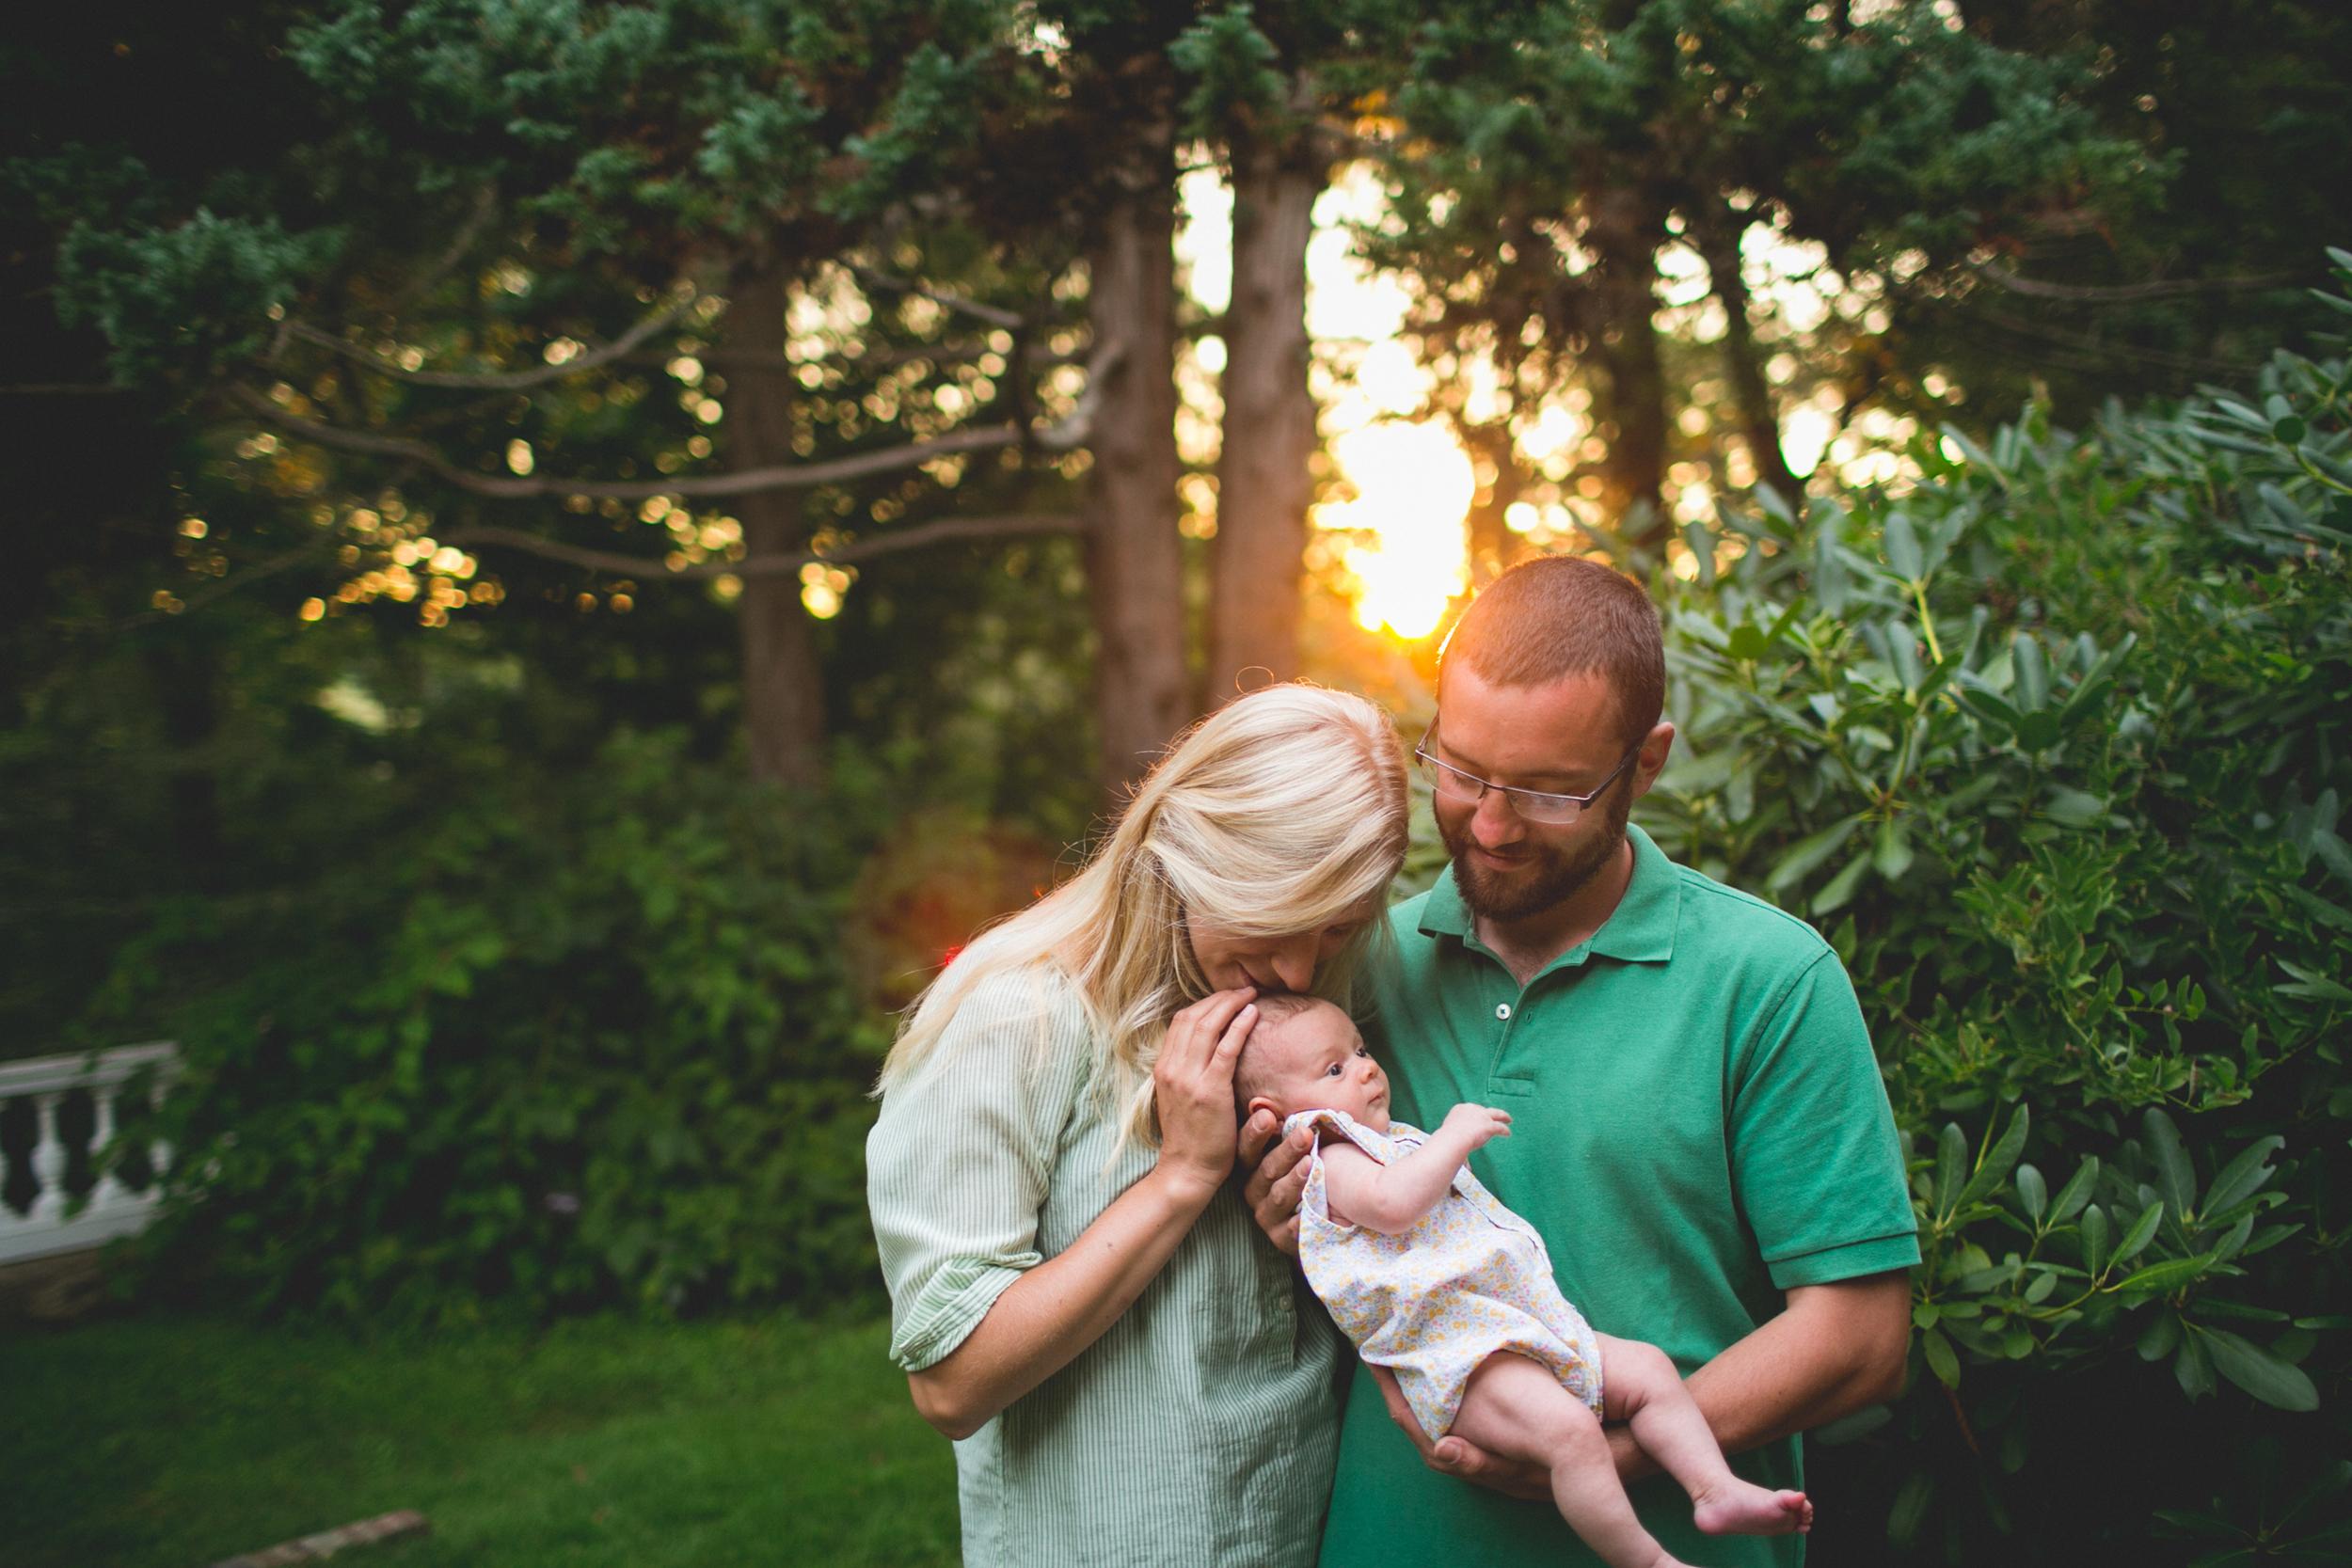 Family-Photographer-Beverly-MA-ytz-16.jpg